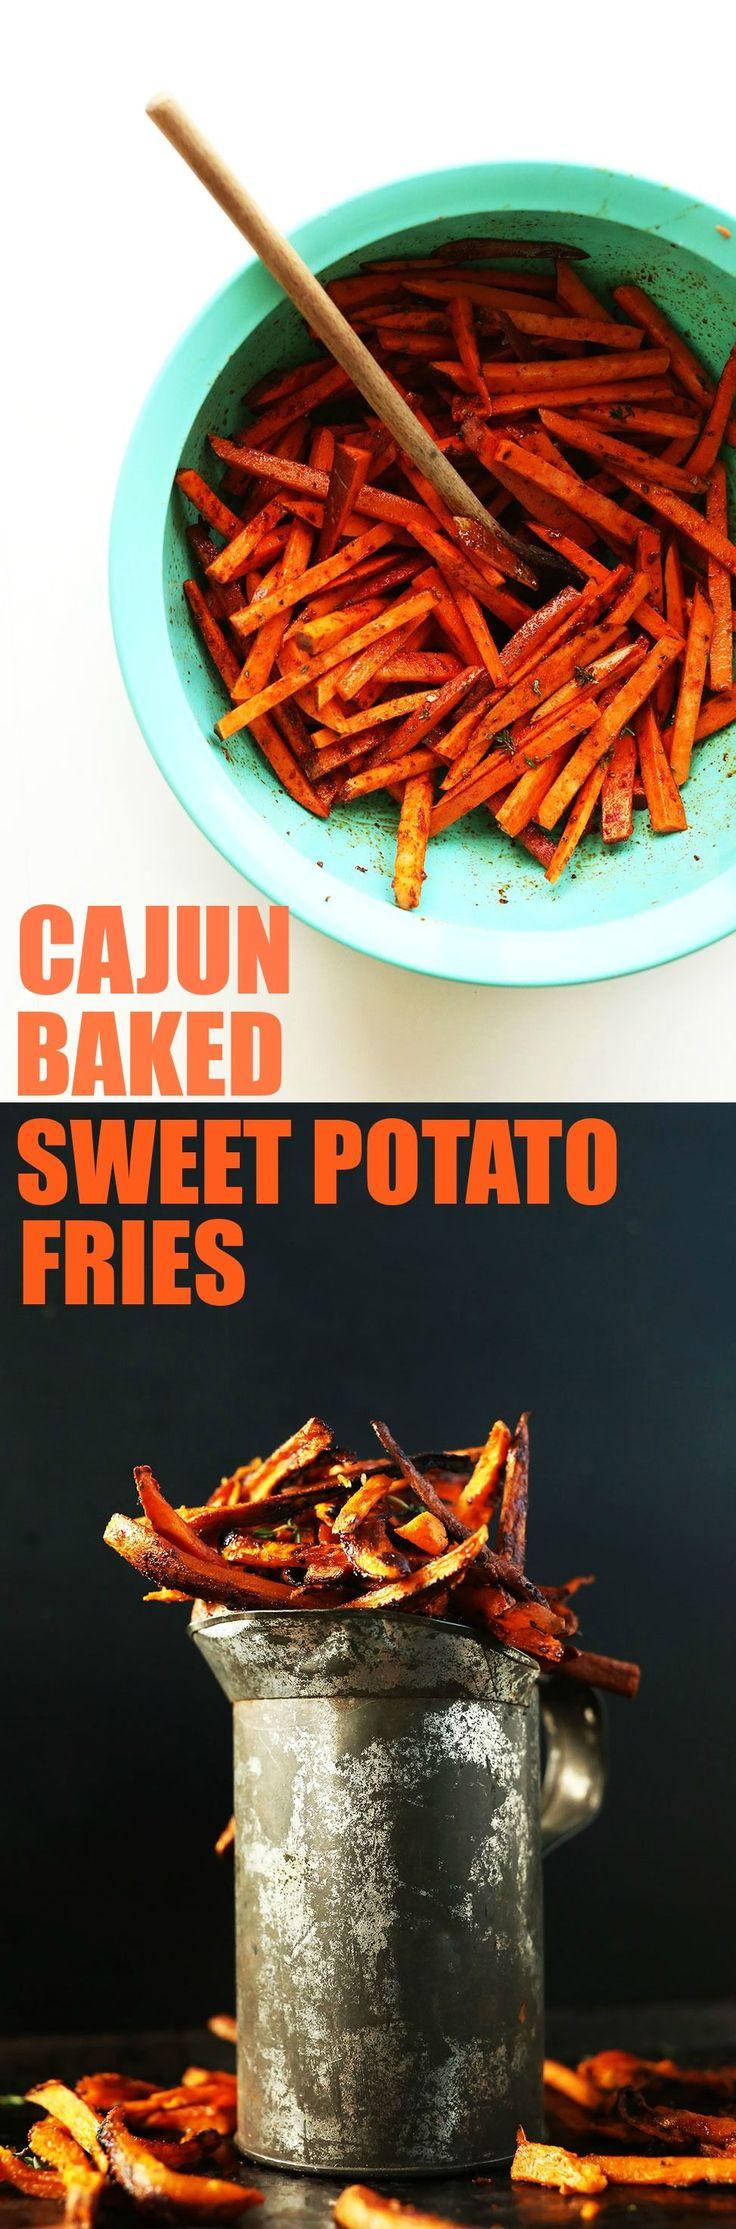 Easy CRISPY Cajun Baked Sweet Potatoes Fries! #healthy #vegan #glutenfree